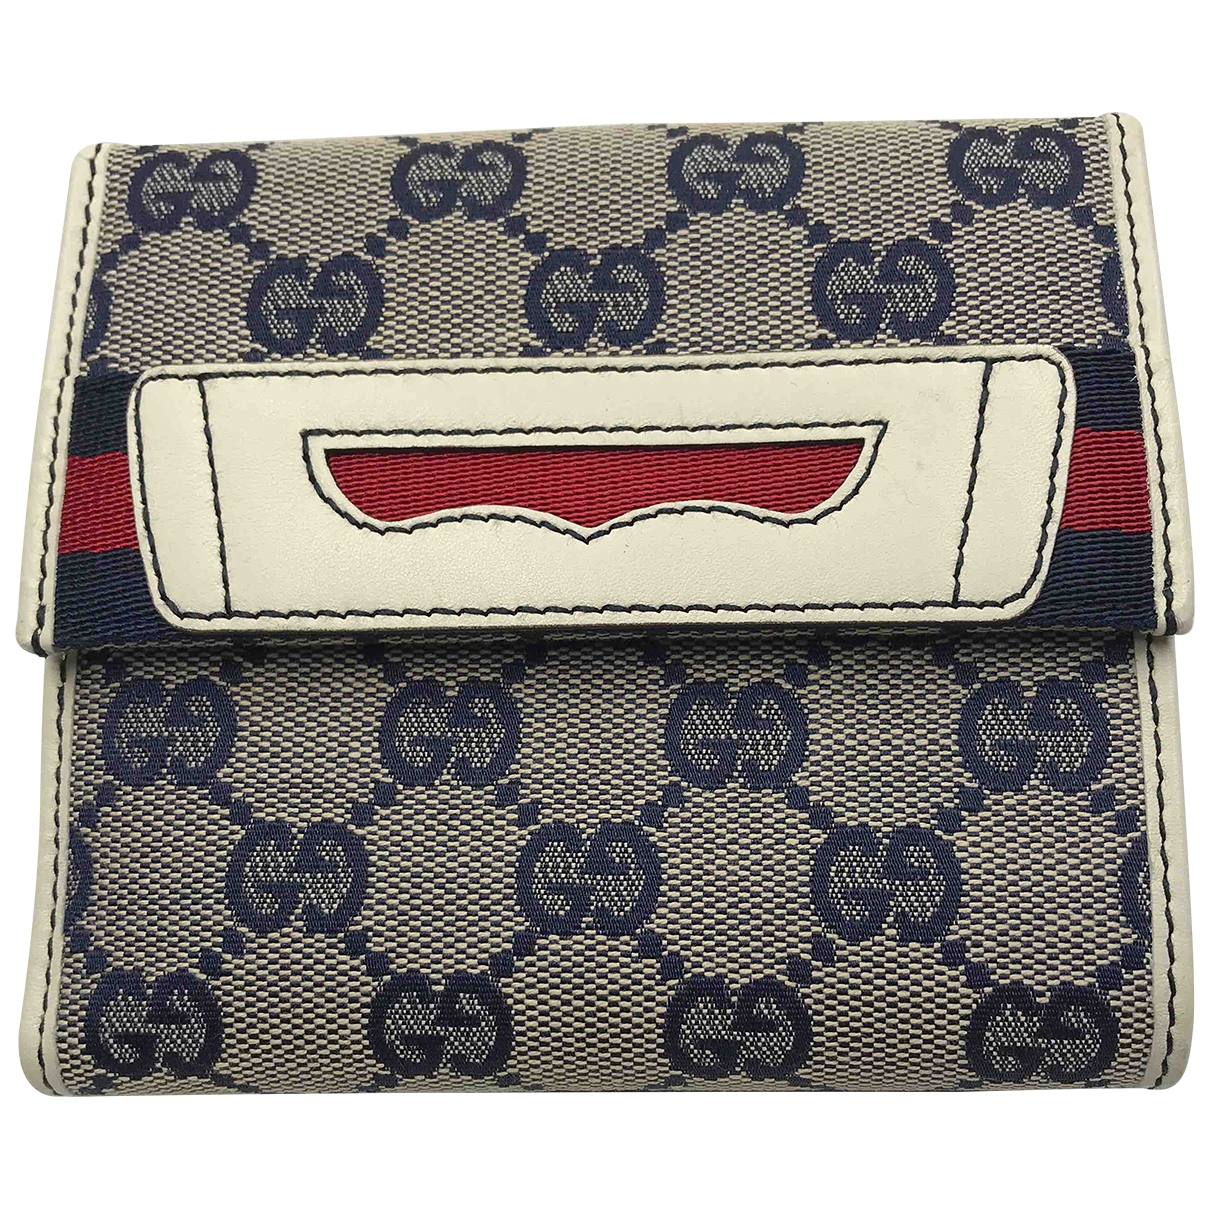 Gucci Ophidia Portemonnaie in  Blau Leinen